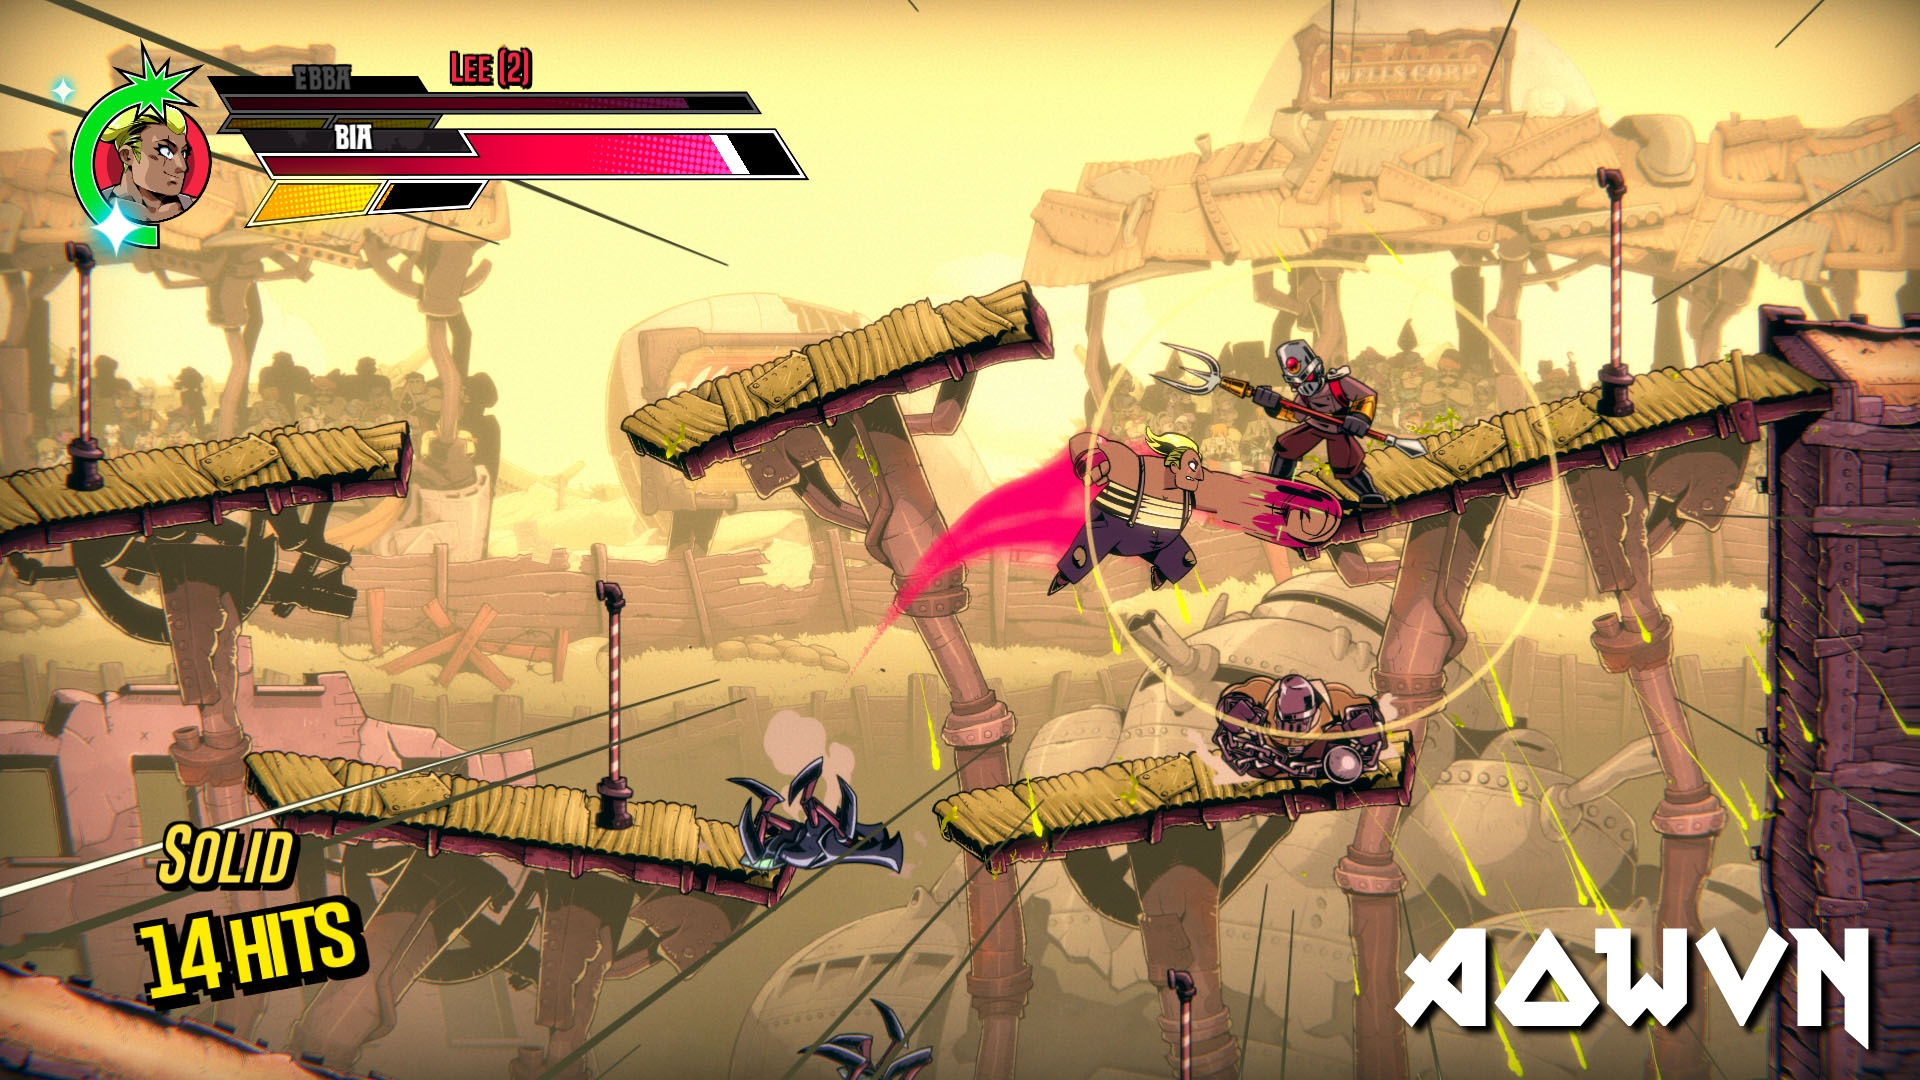 Speed Brawl Screenshot 1 1 - [ NEW ] Game : Speed Brawl | PC